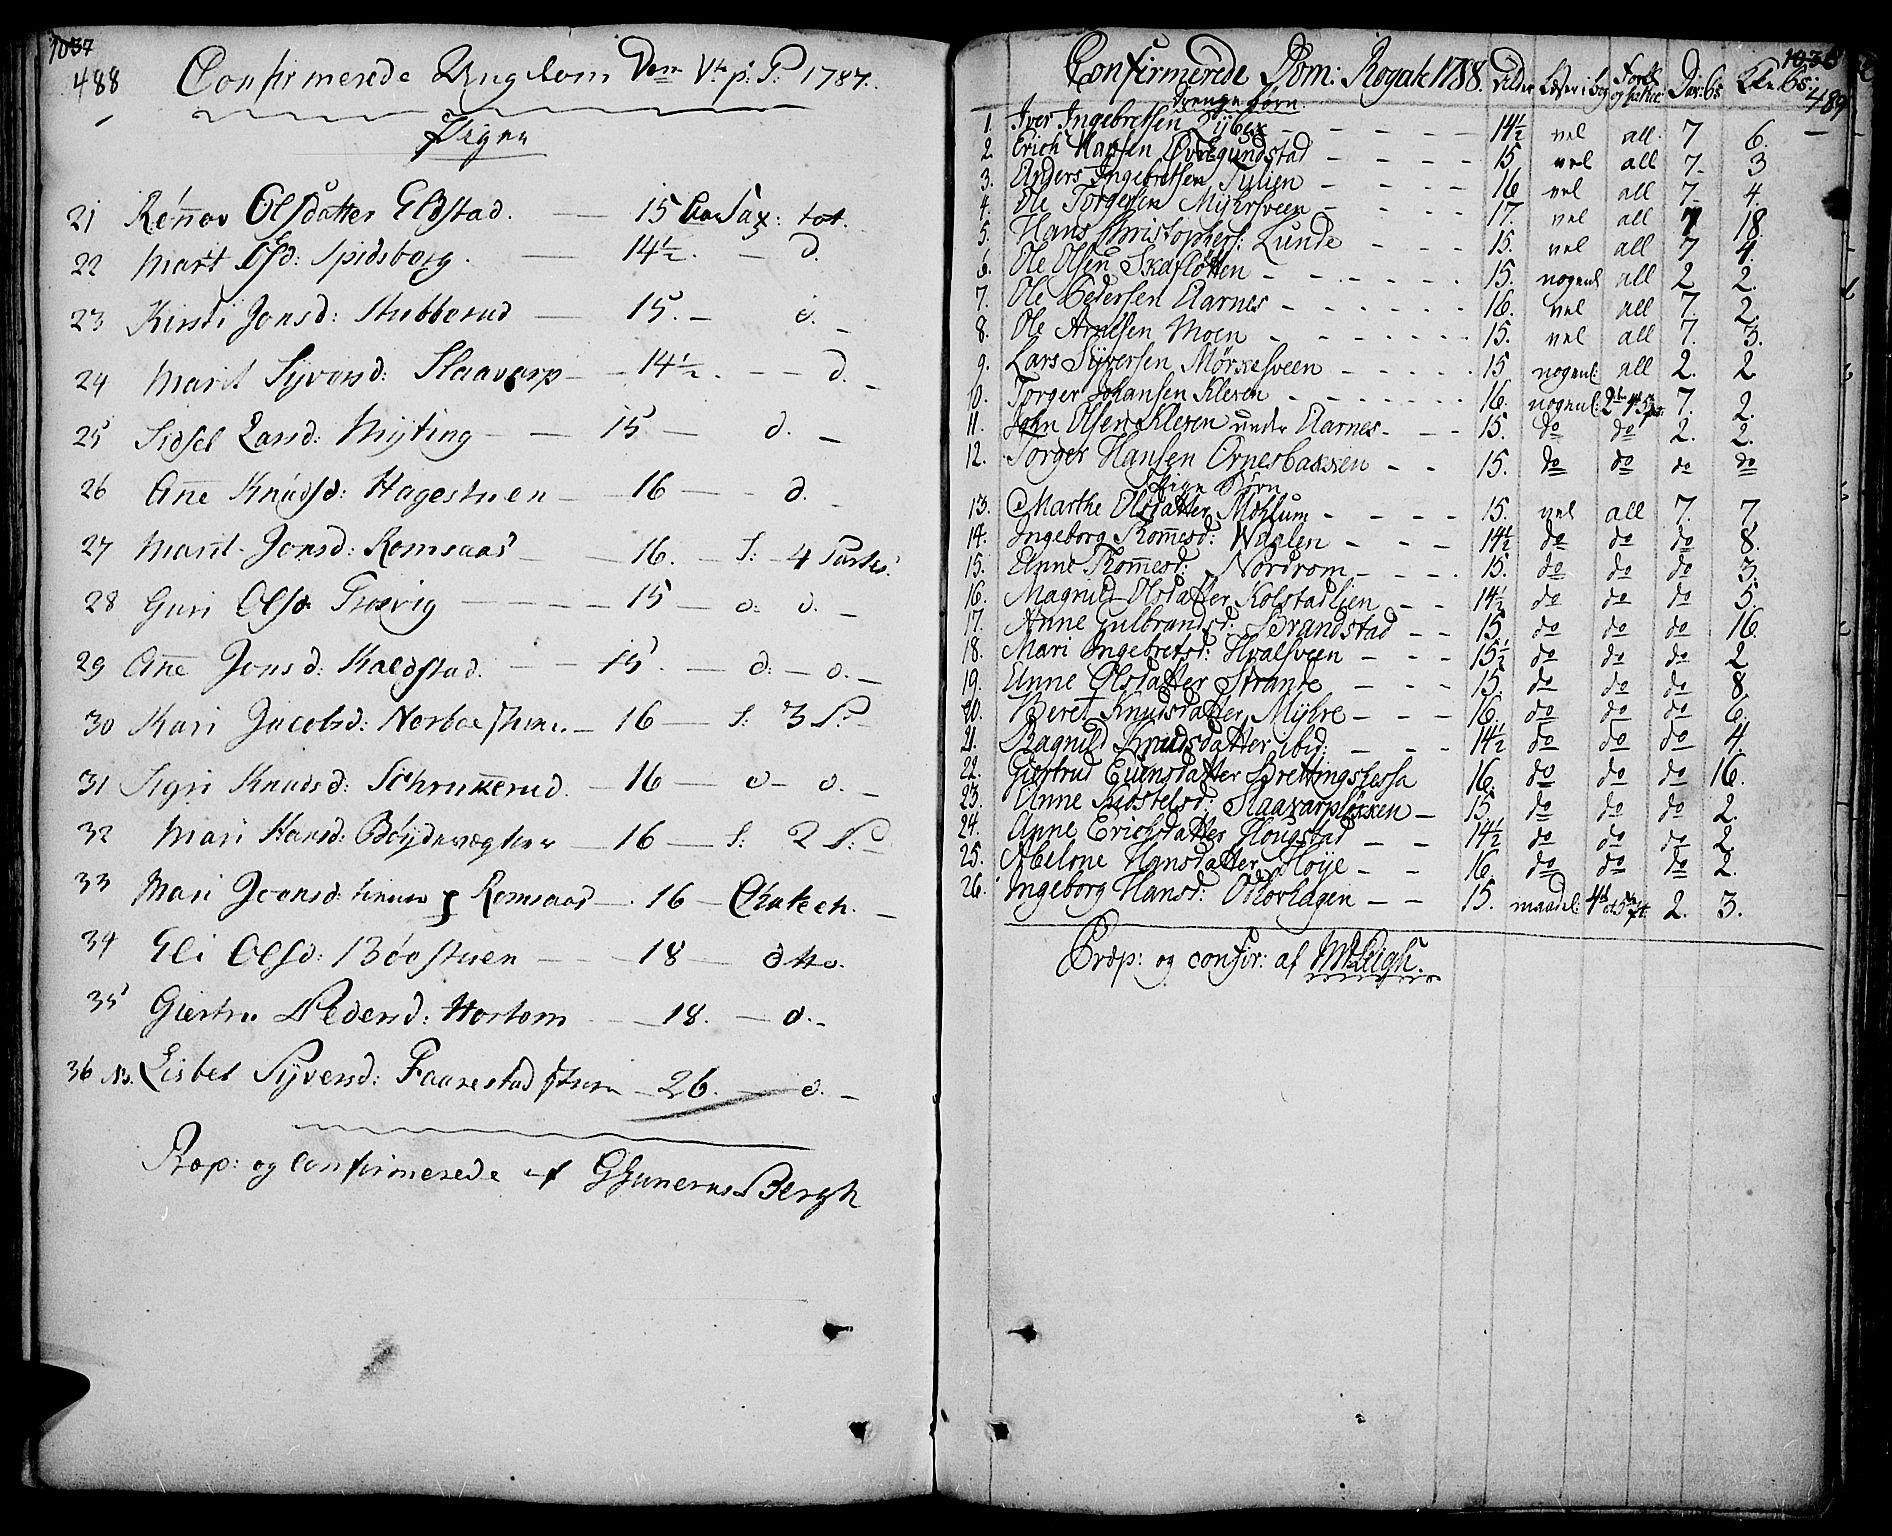 SAH, Ringebu prestekontor, Ministerialbok nr. 3, 1781-1820, s. 488-489